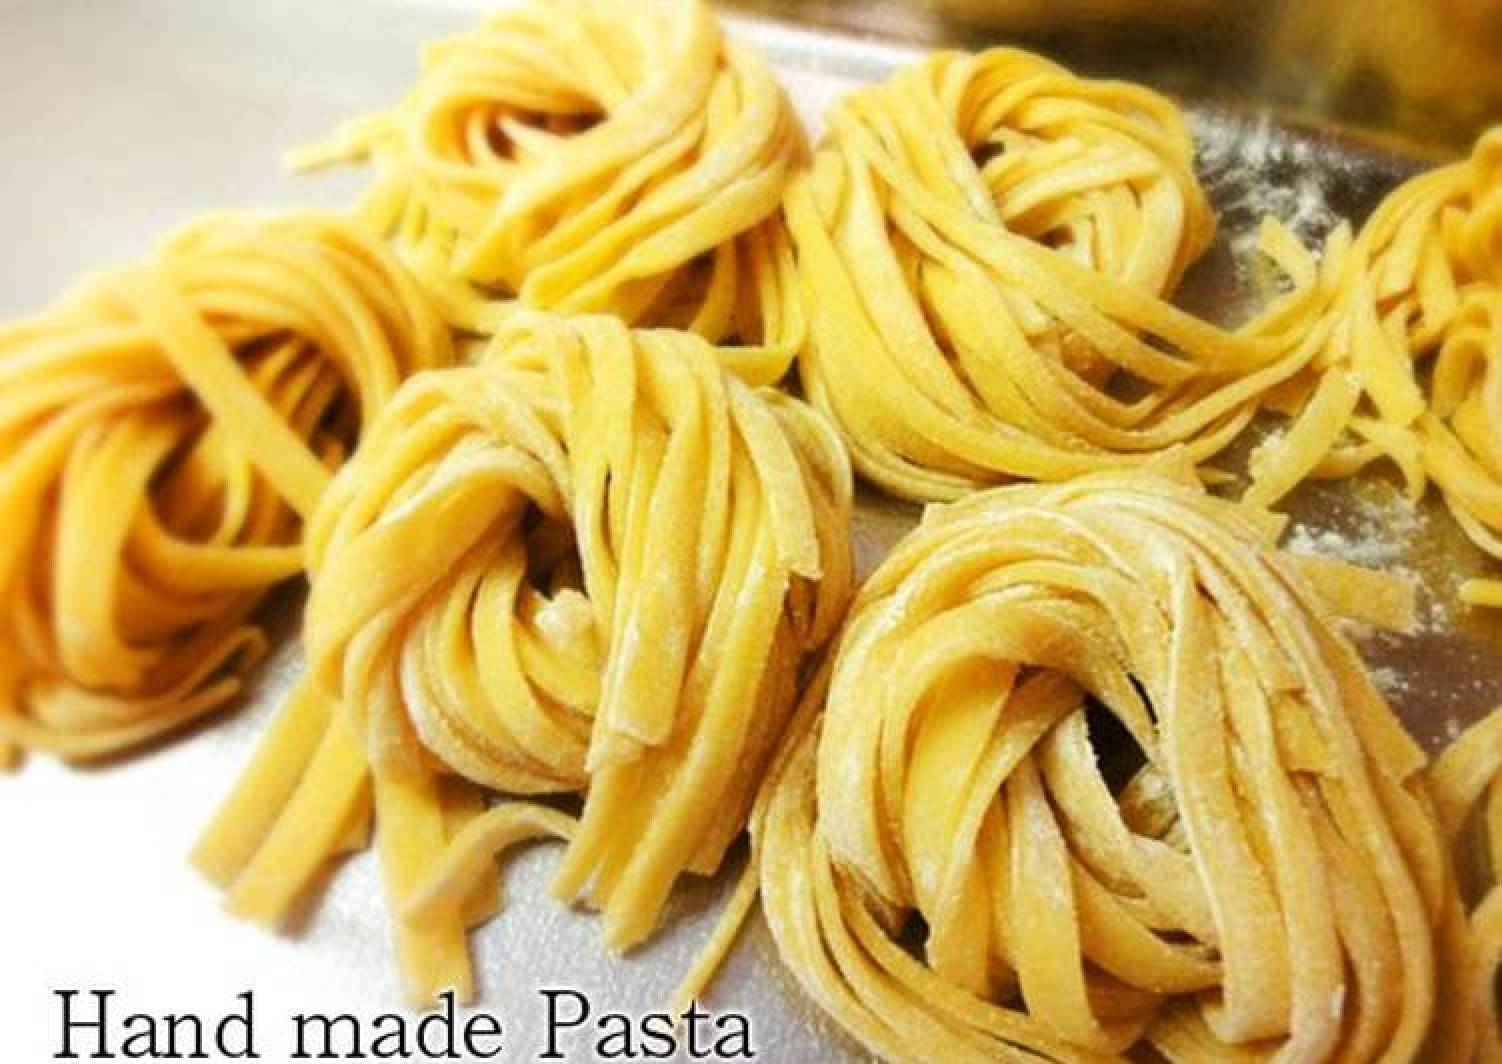 Handmade Fresh Pasta with Leftover Egg Yolks (in a bread maker)